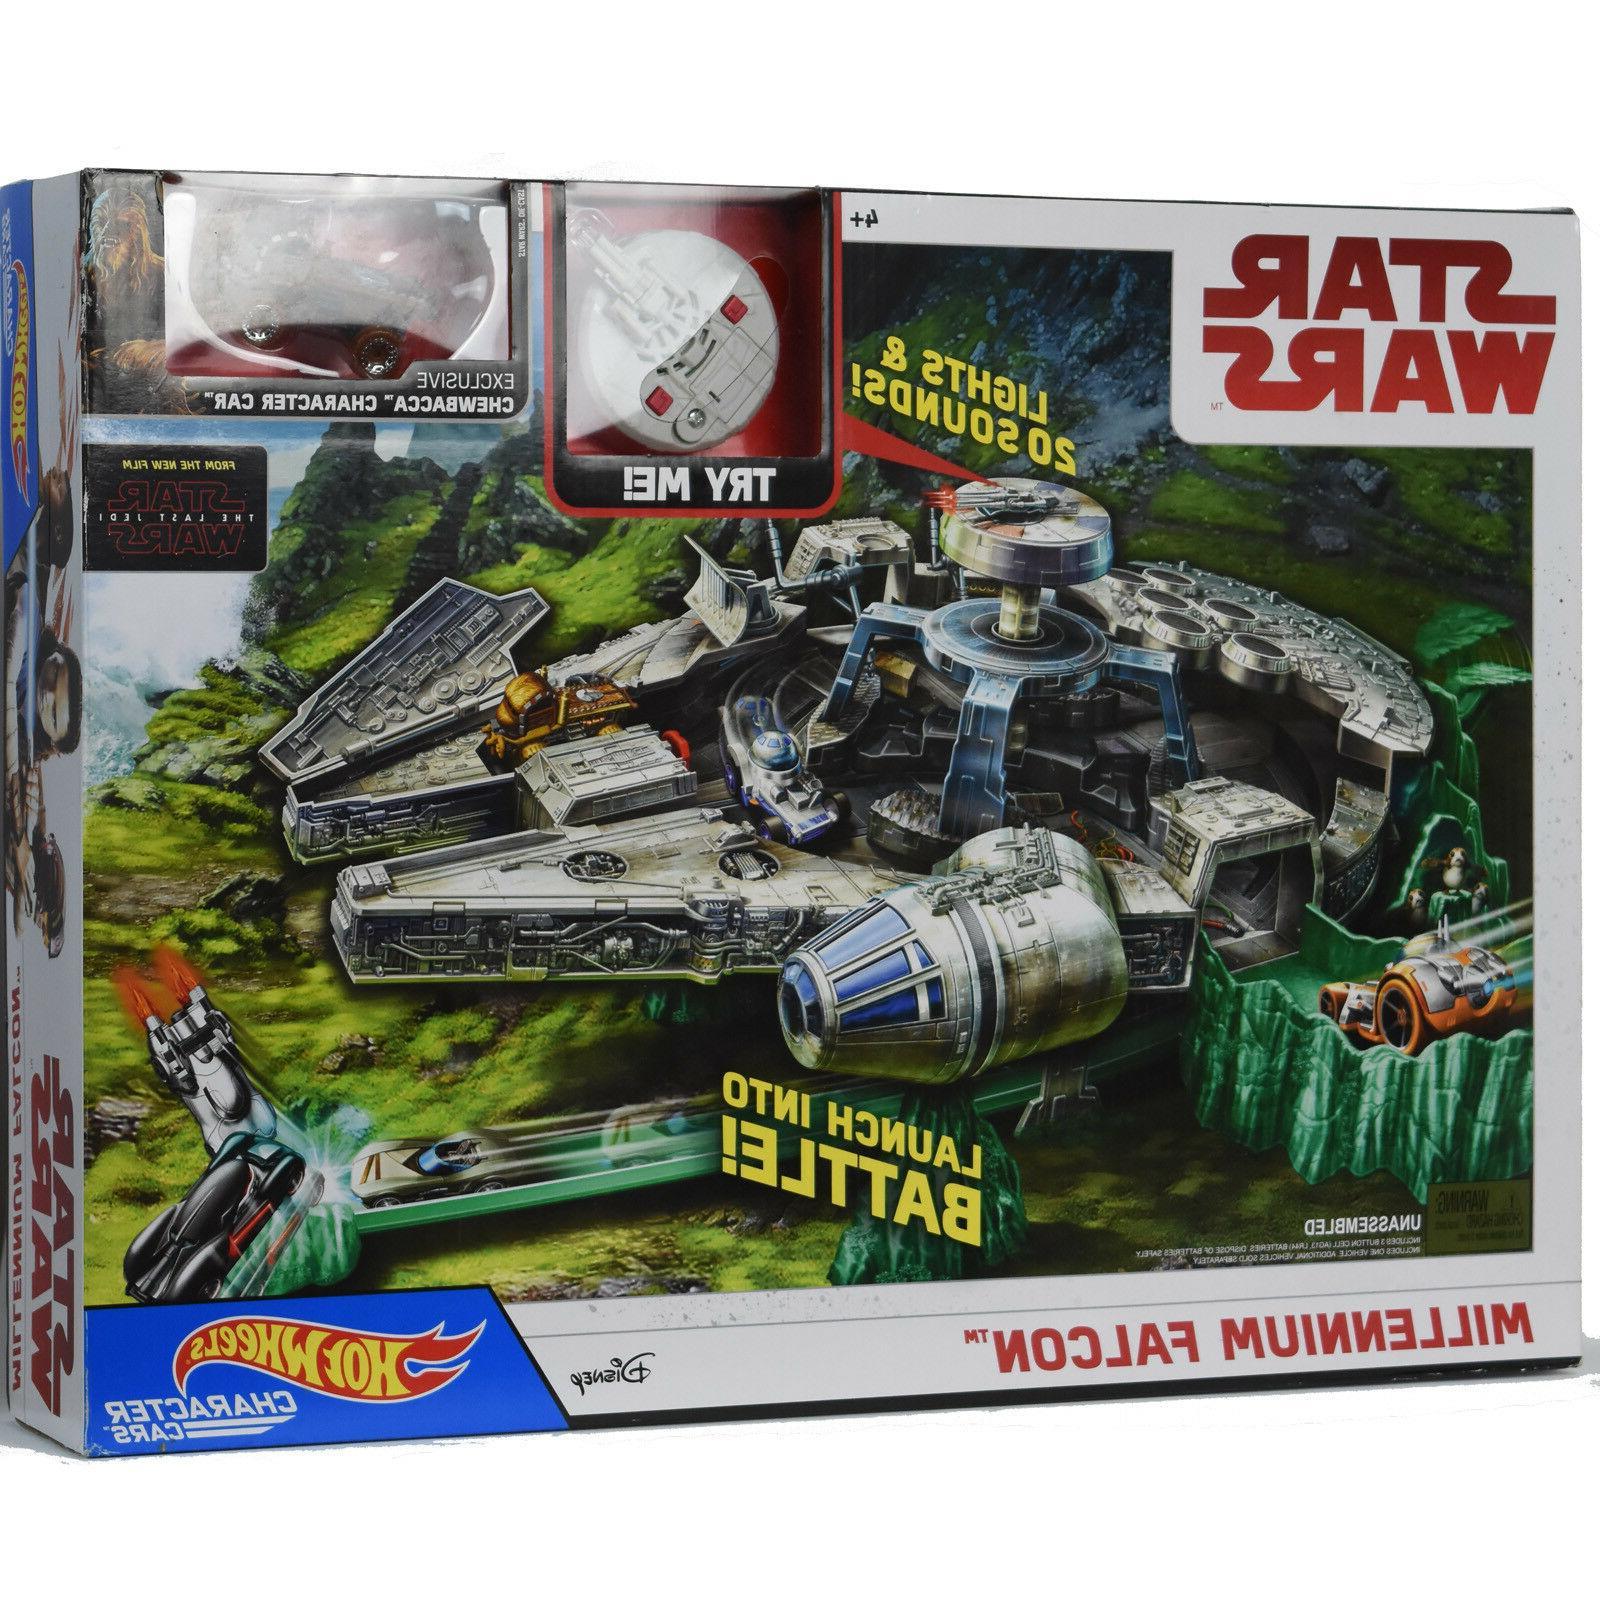 star wars millennium falcon playset